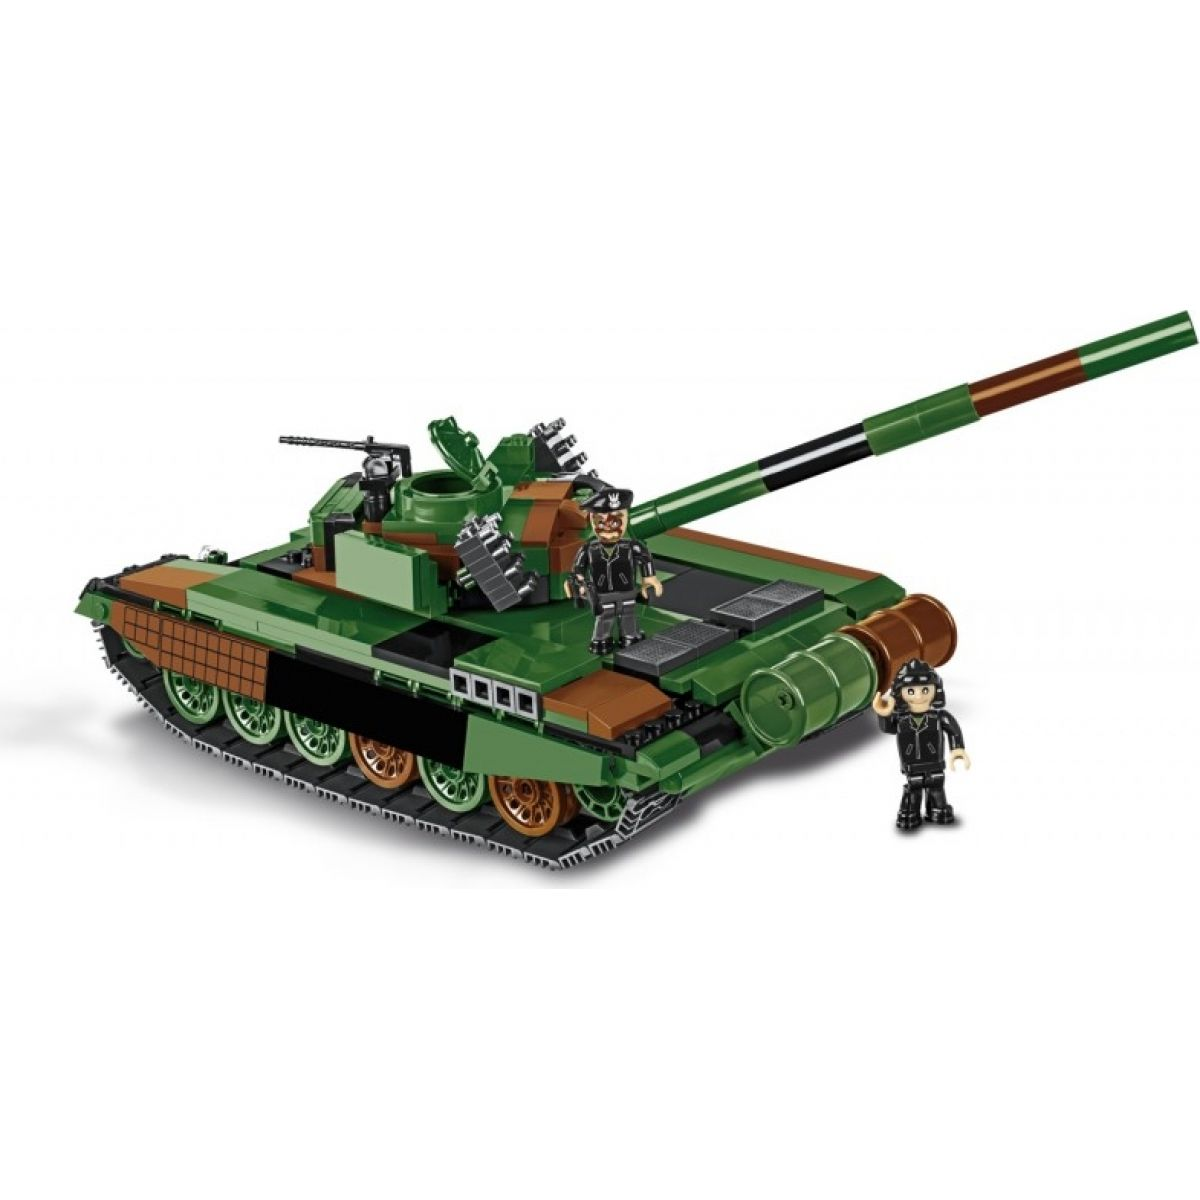 COBI 2612 Small Army Tank PT91 twarda, 535 k, 2 f